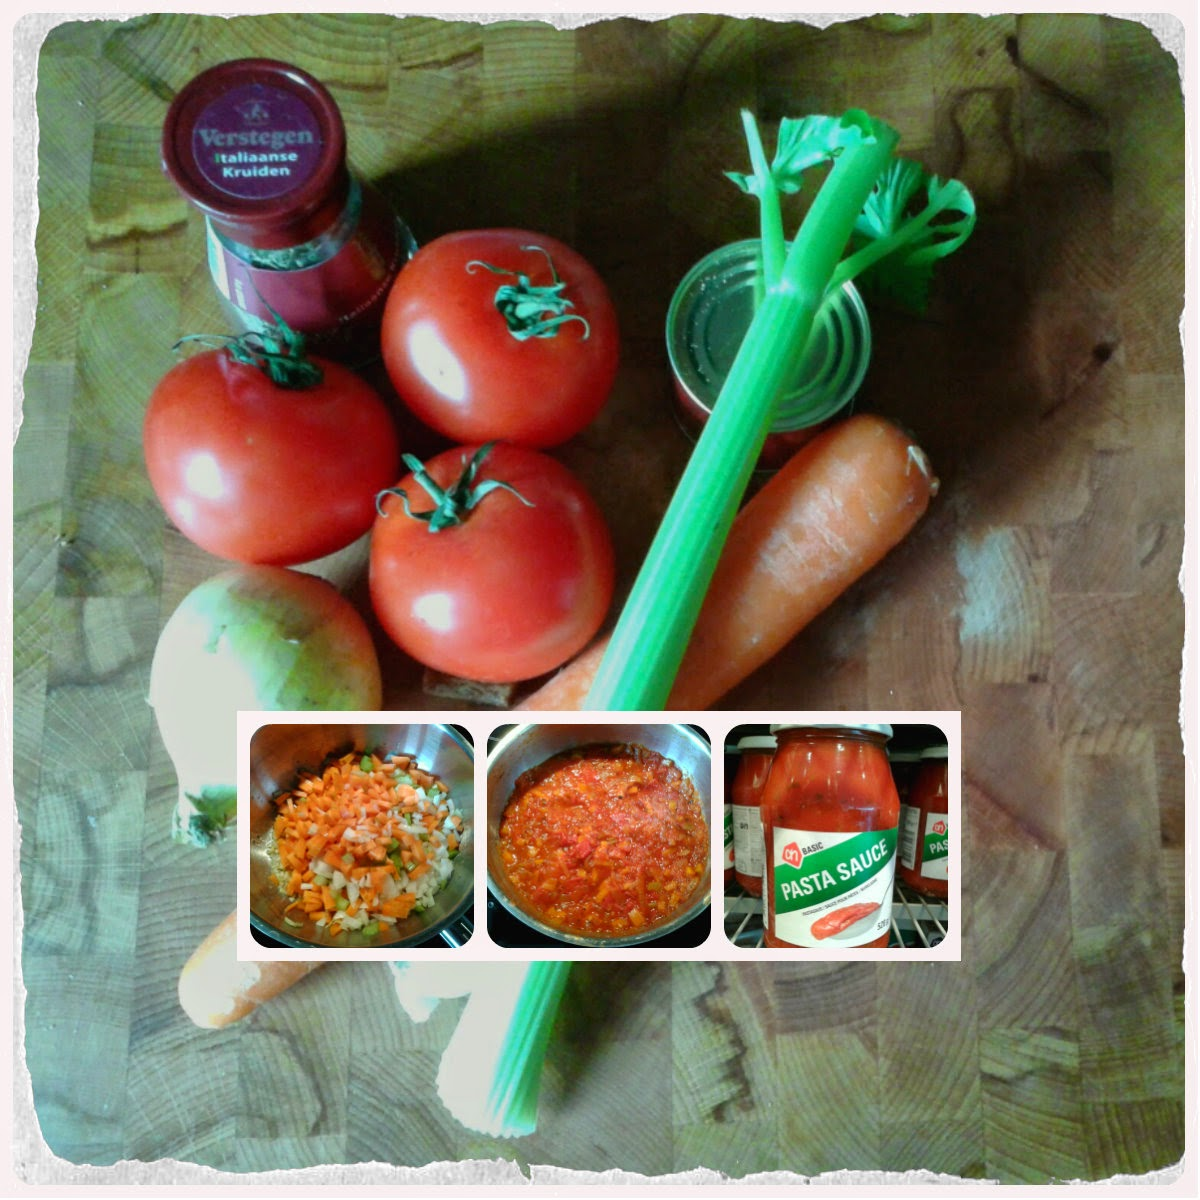 Uitdaging: Is verse pastasaus duurder dan kant en klare pastasaus?